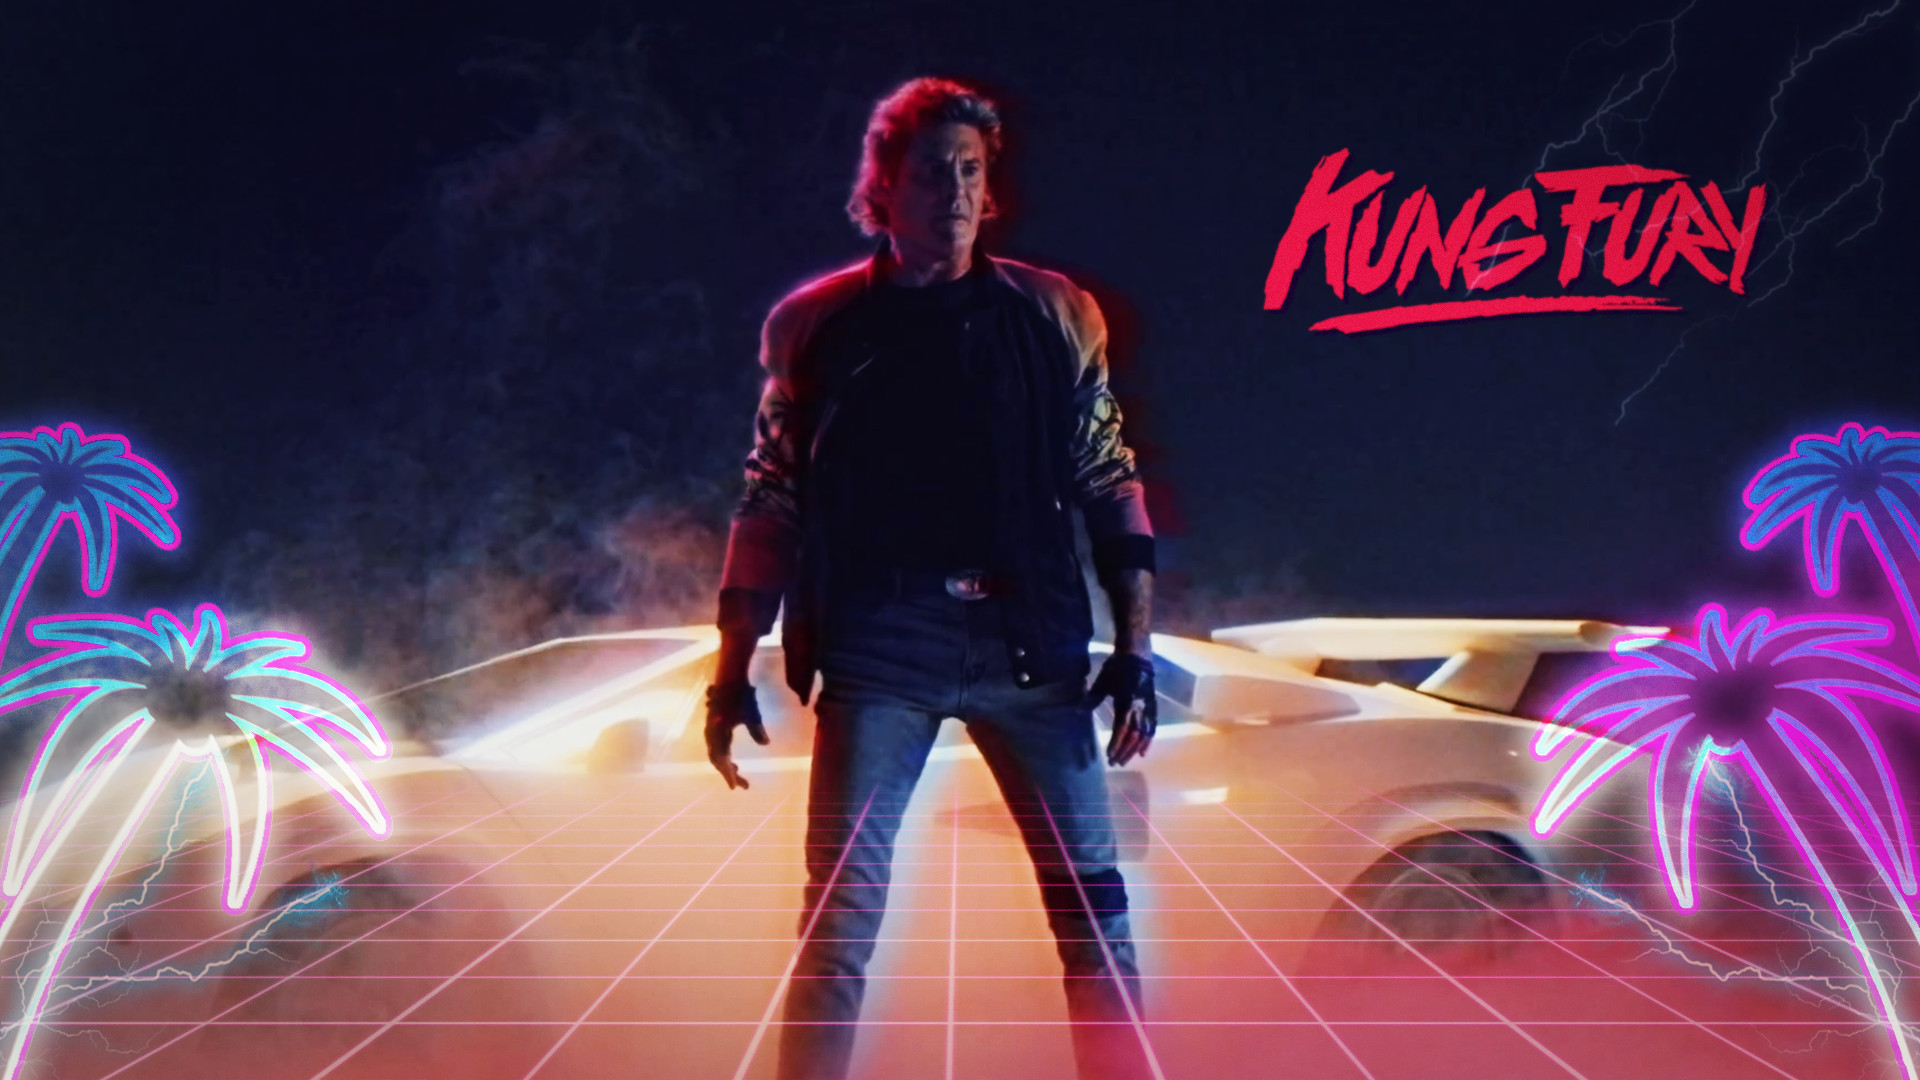 … Kung Fury Fan-Made Wallpaper by VertiGo-Official